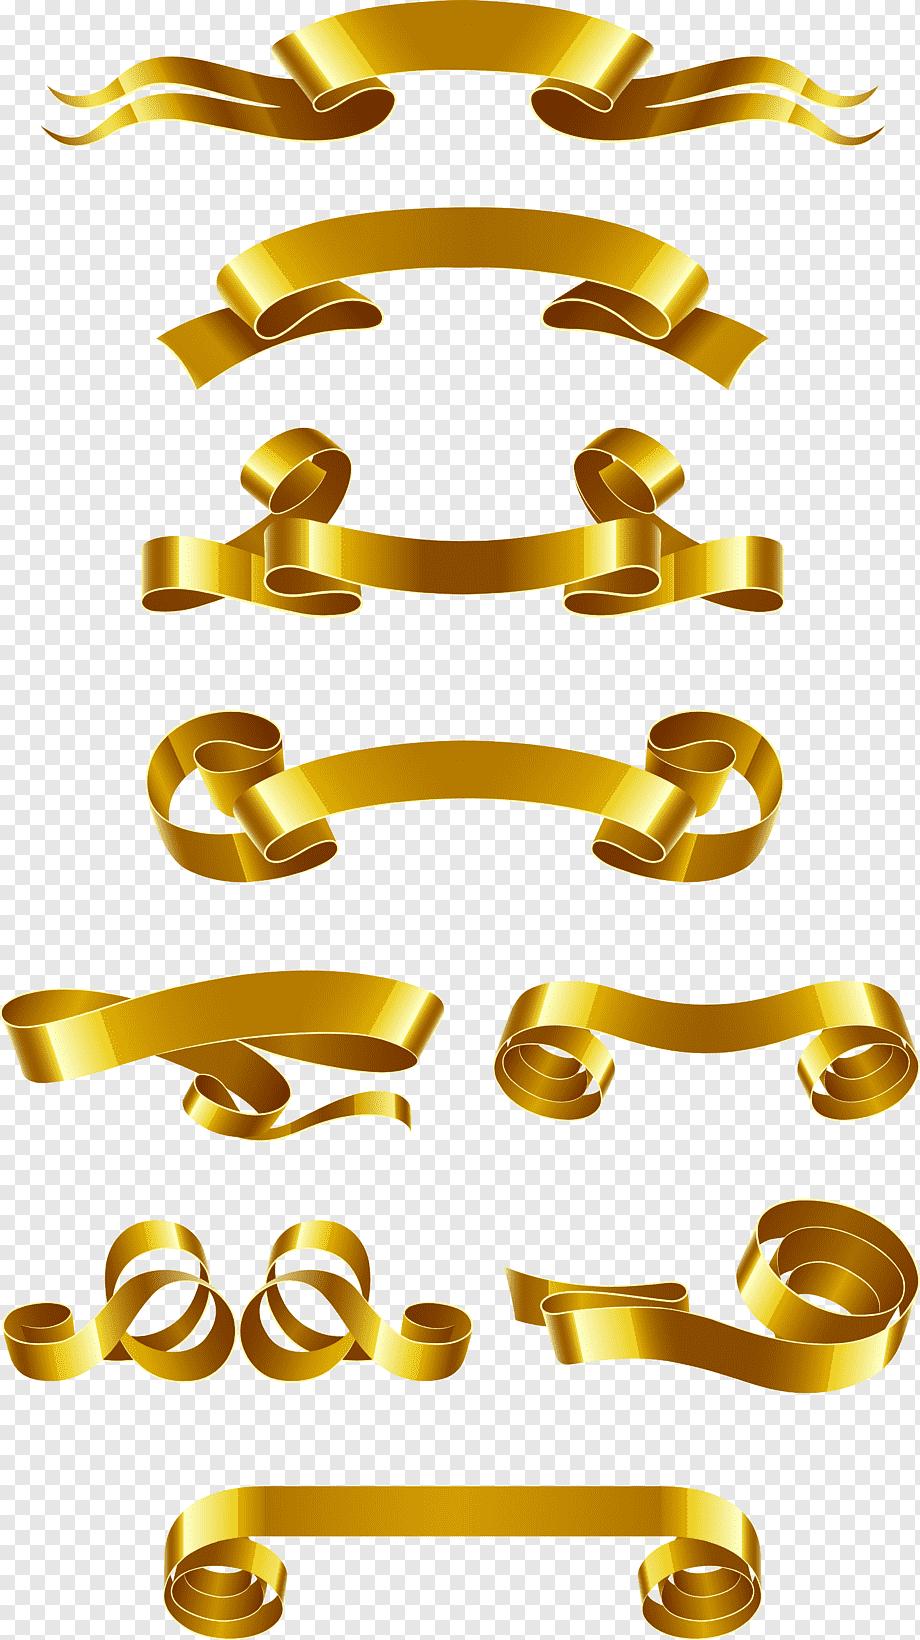 Logo Pita Emas : Banner, Ribbon, Euclidean,, Bahan, Spanduk, Emas,, Banyak, Lainnya,, Teks,, PNGWing